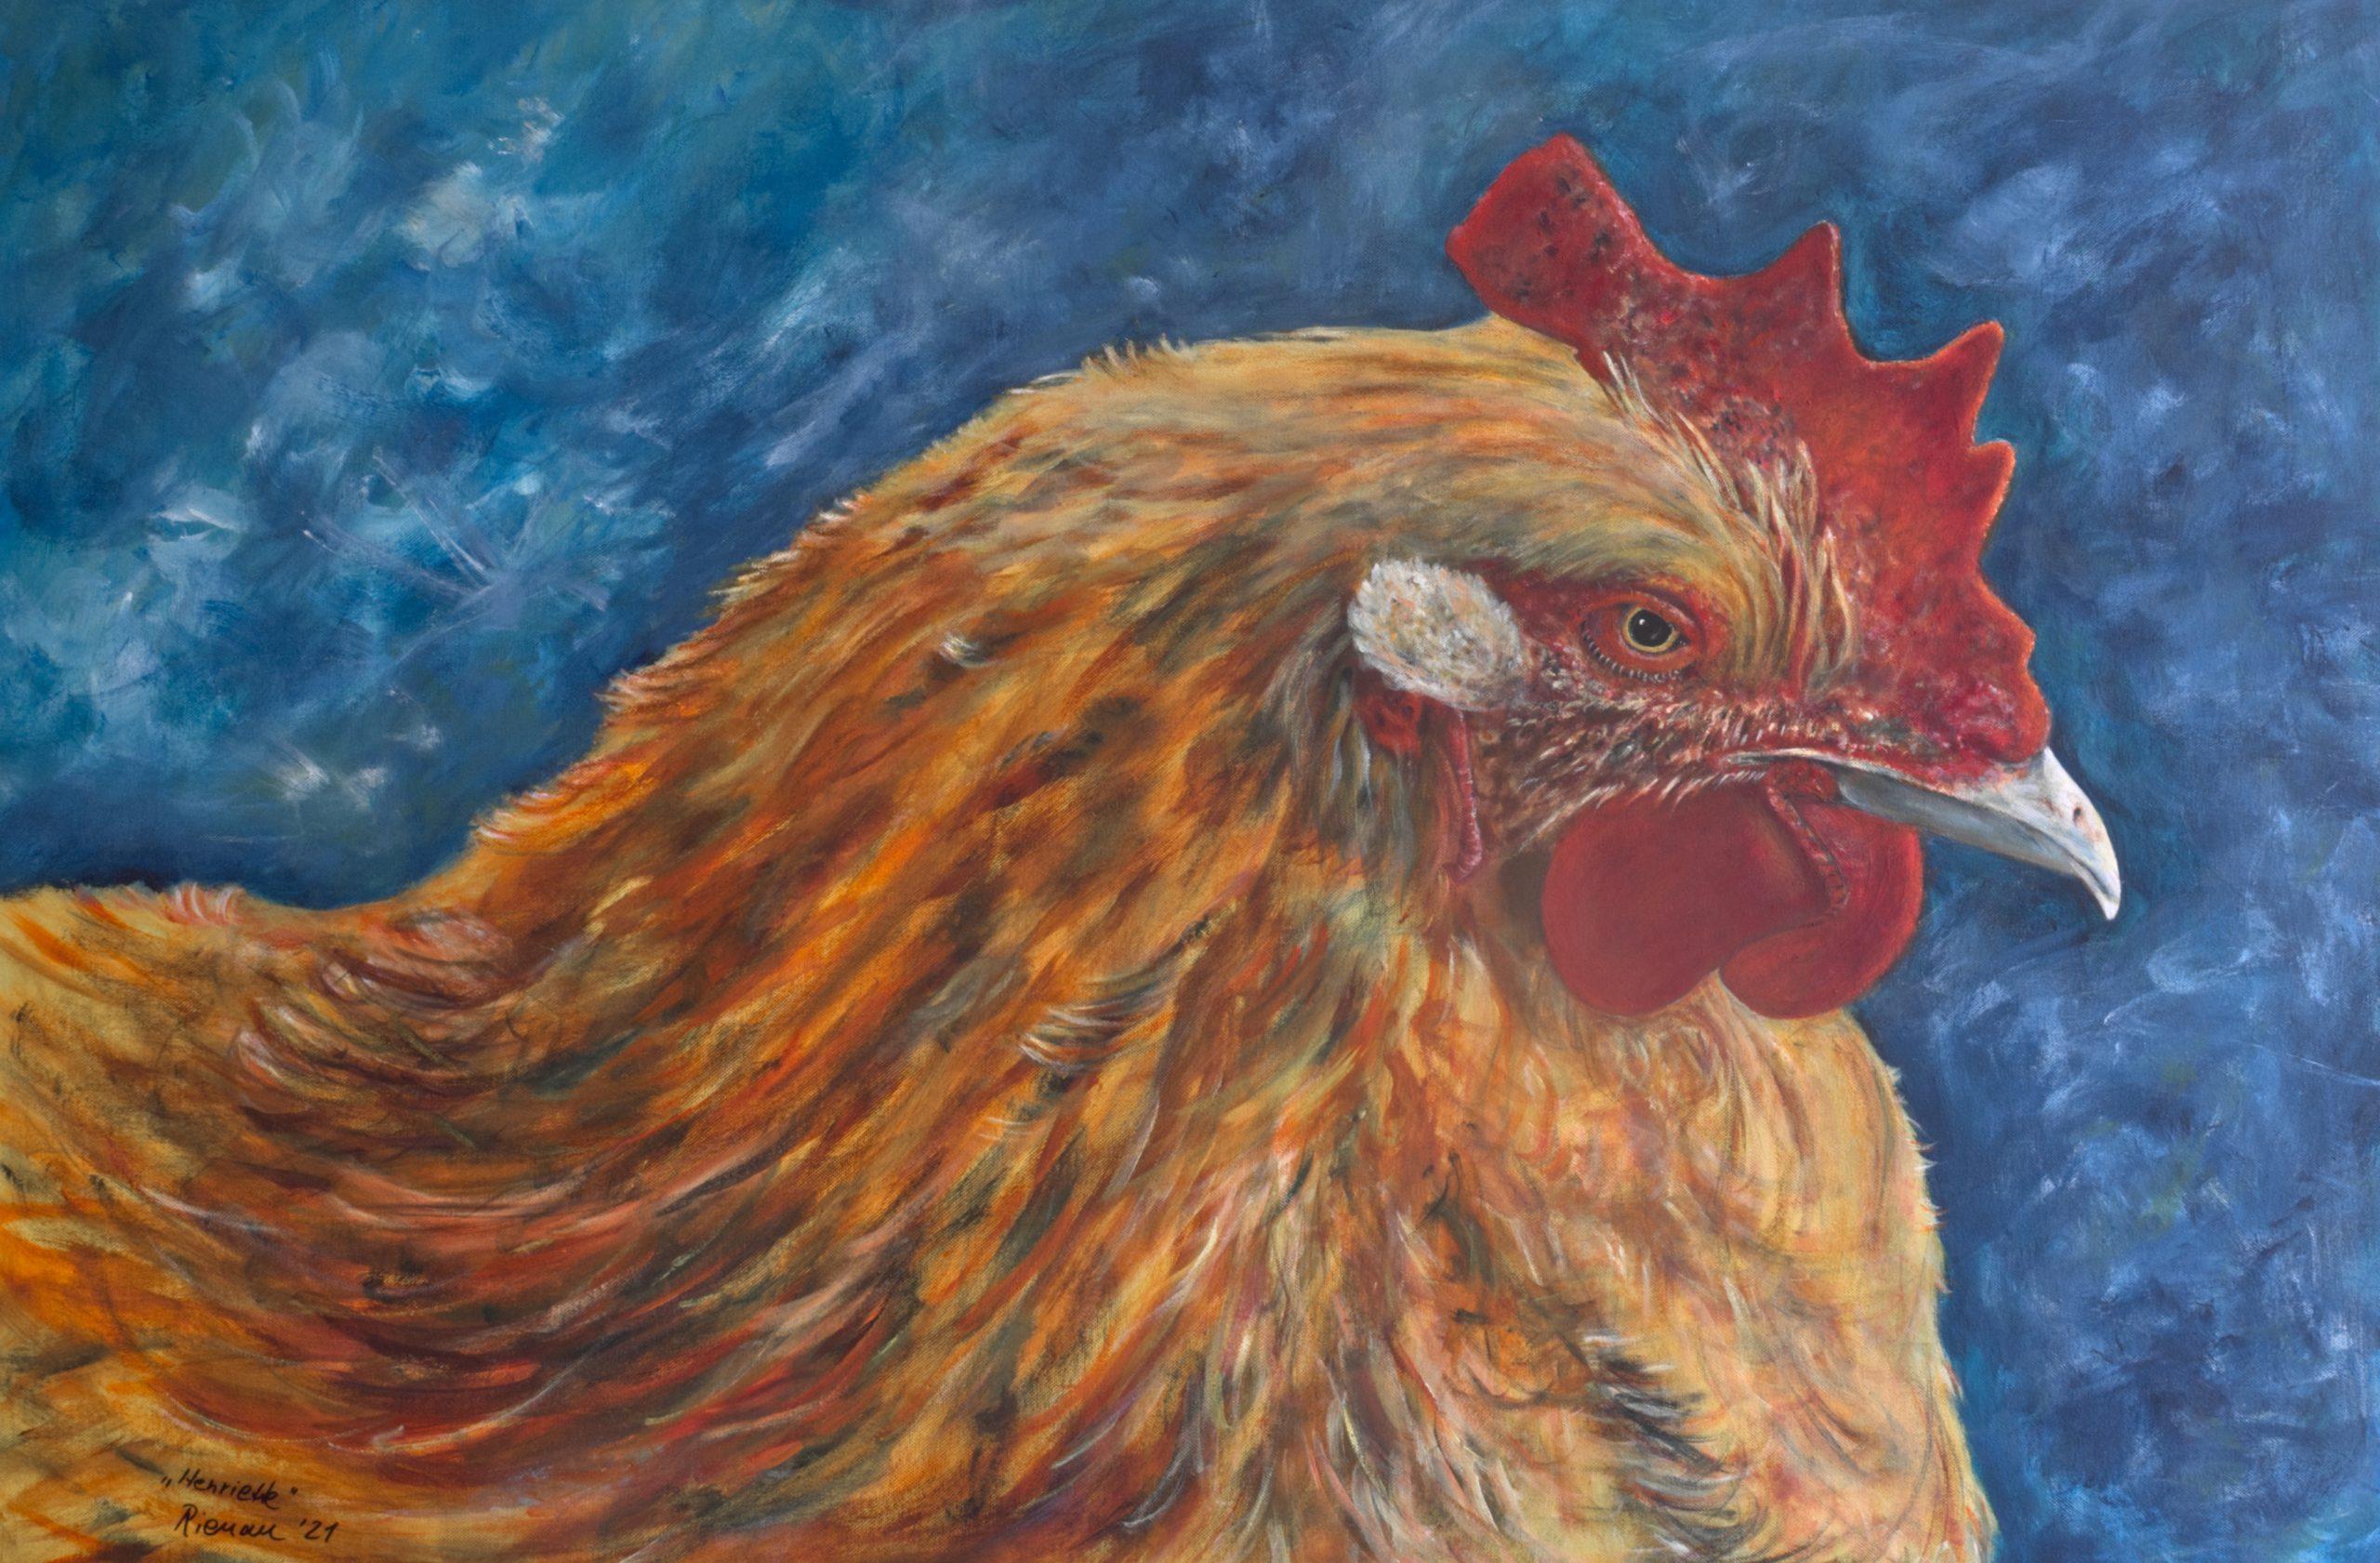 Huhn, Acryl auf Leinwand